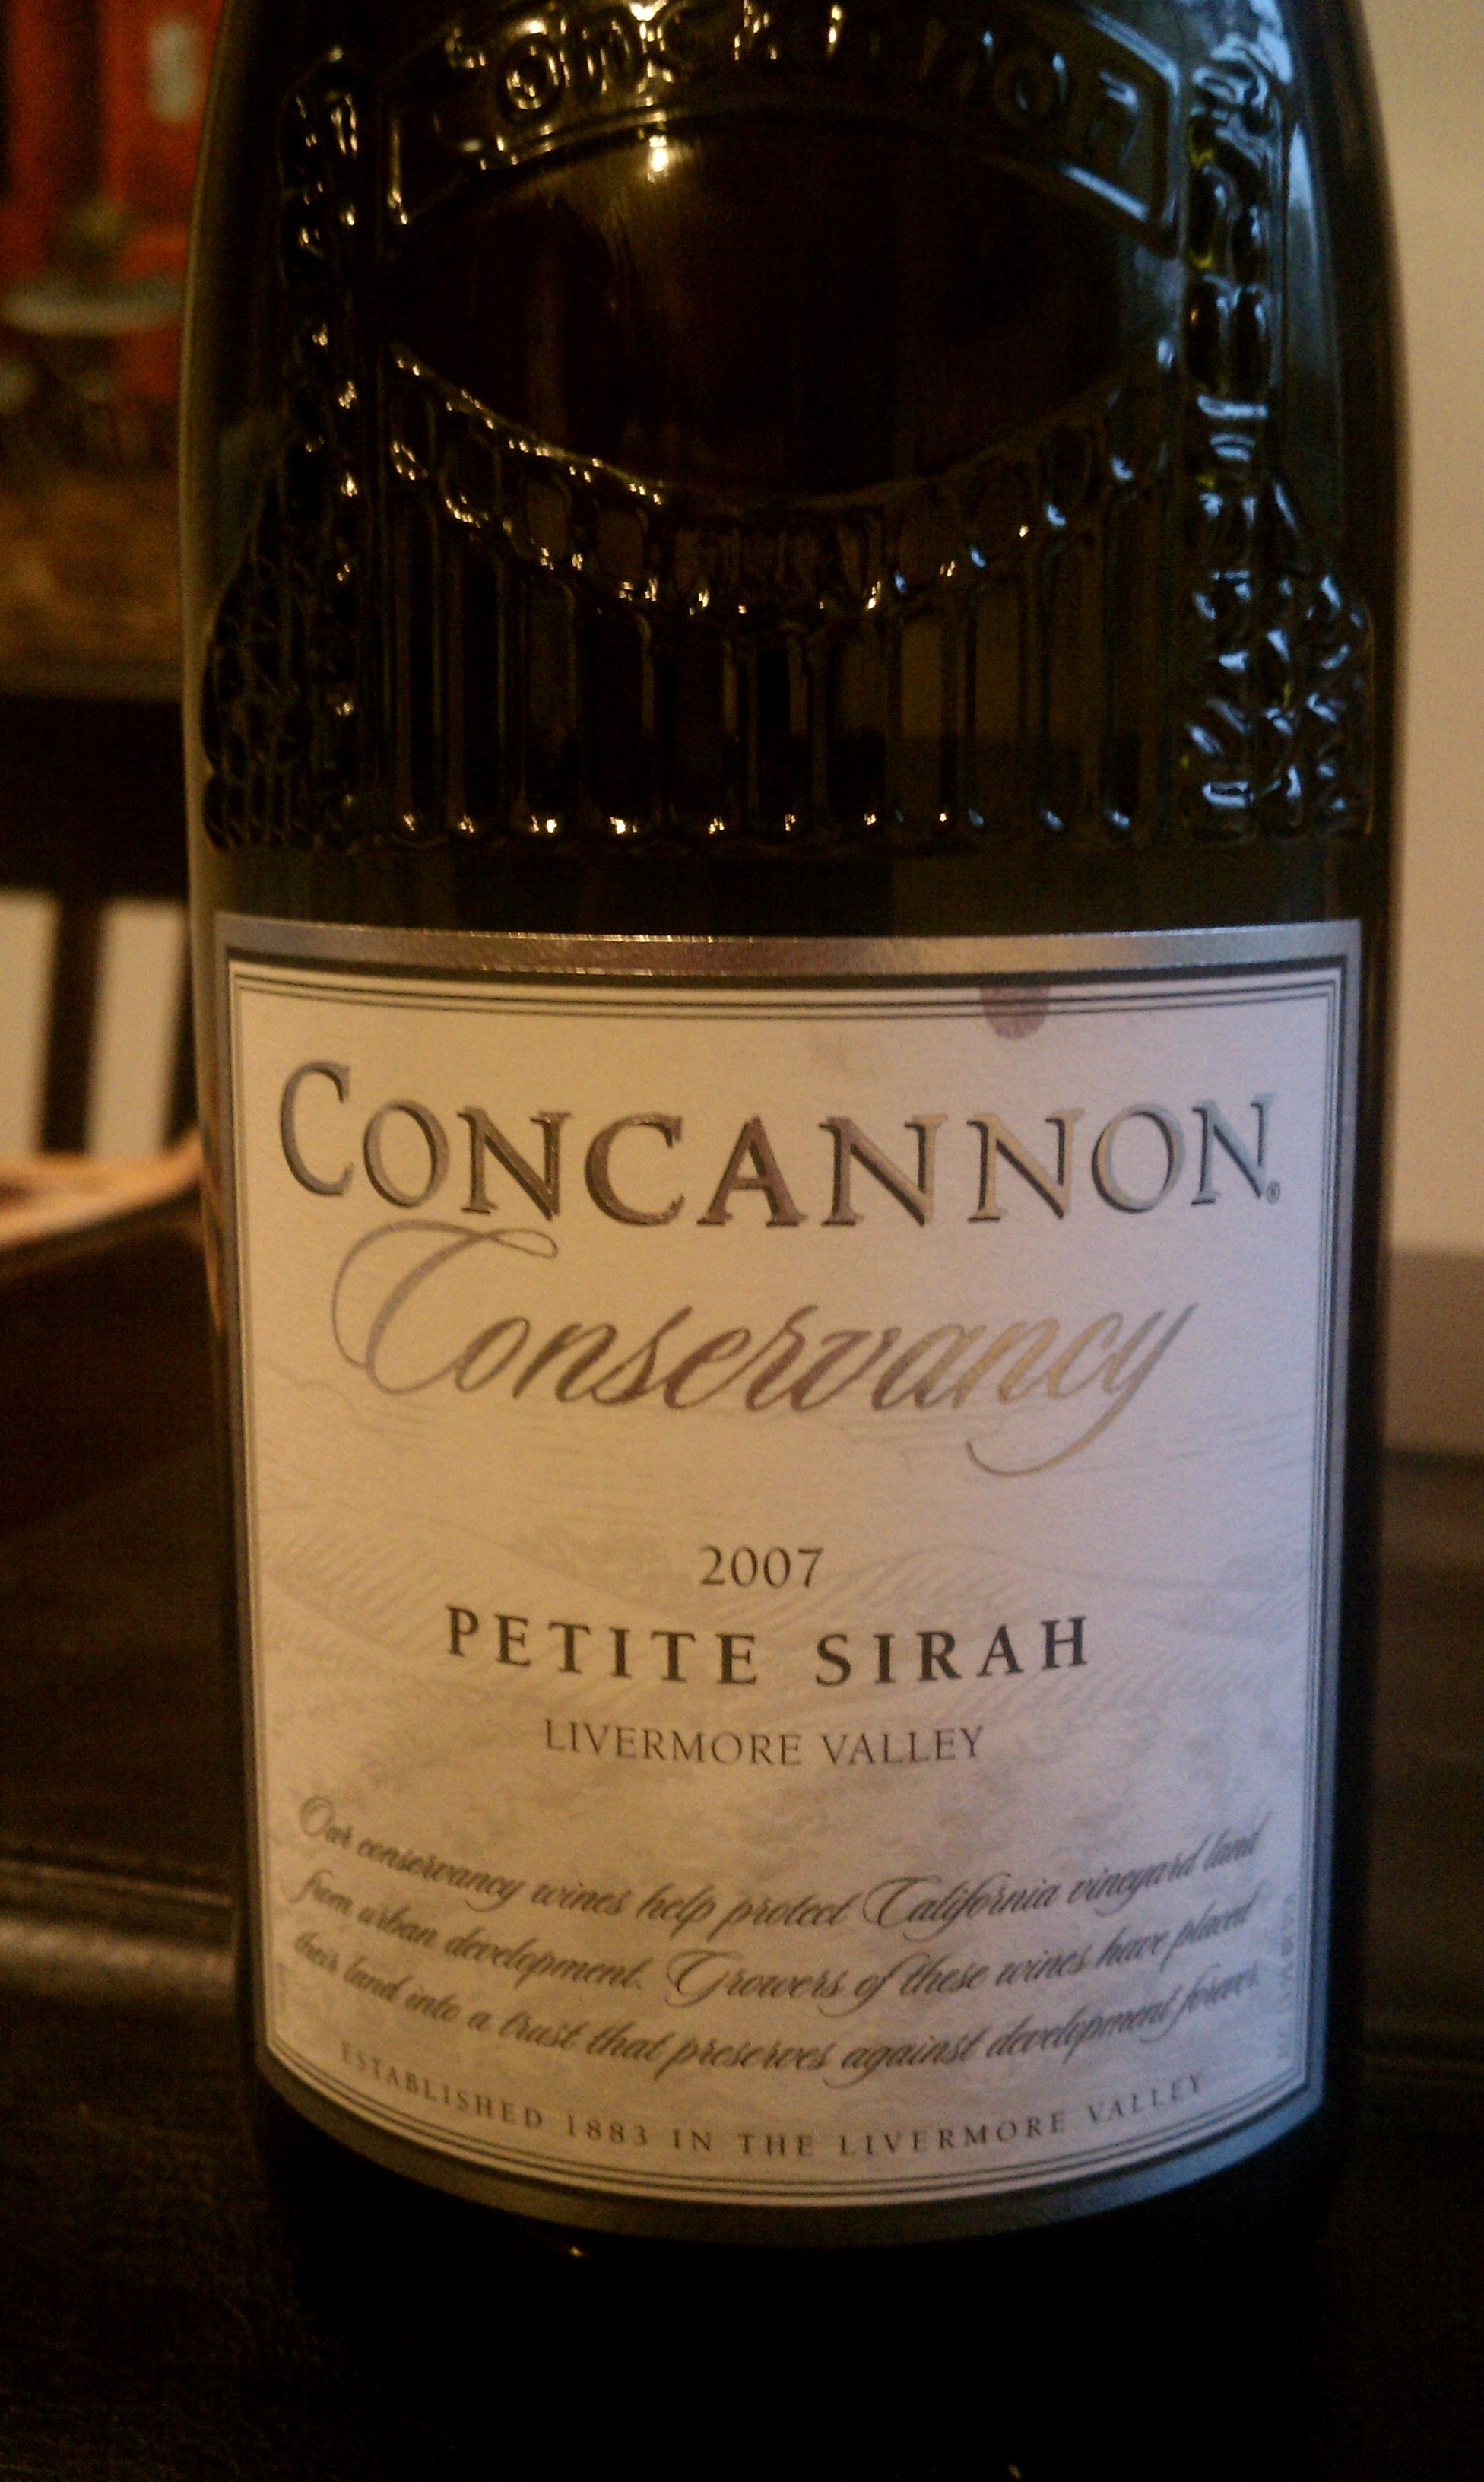 2007 Concannon Conservancy Petite Sirah